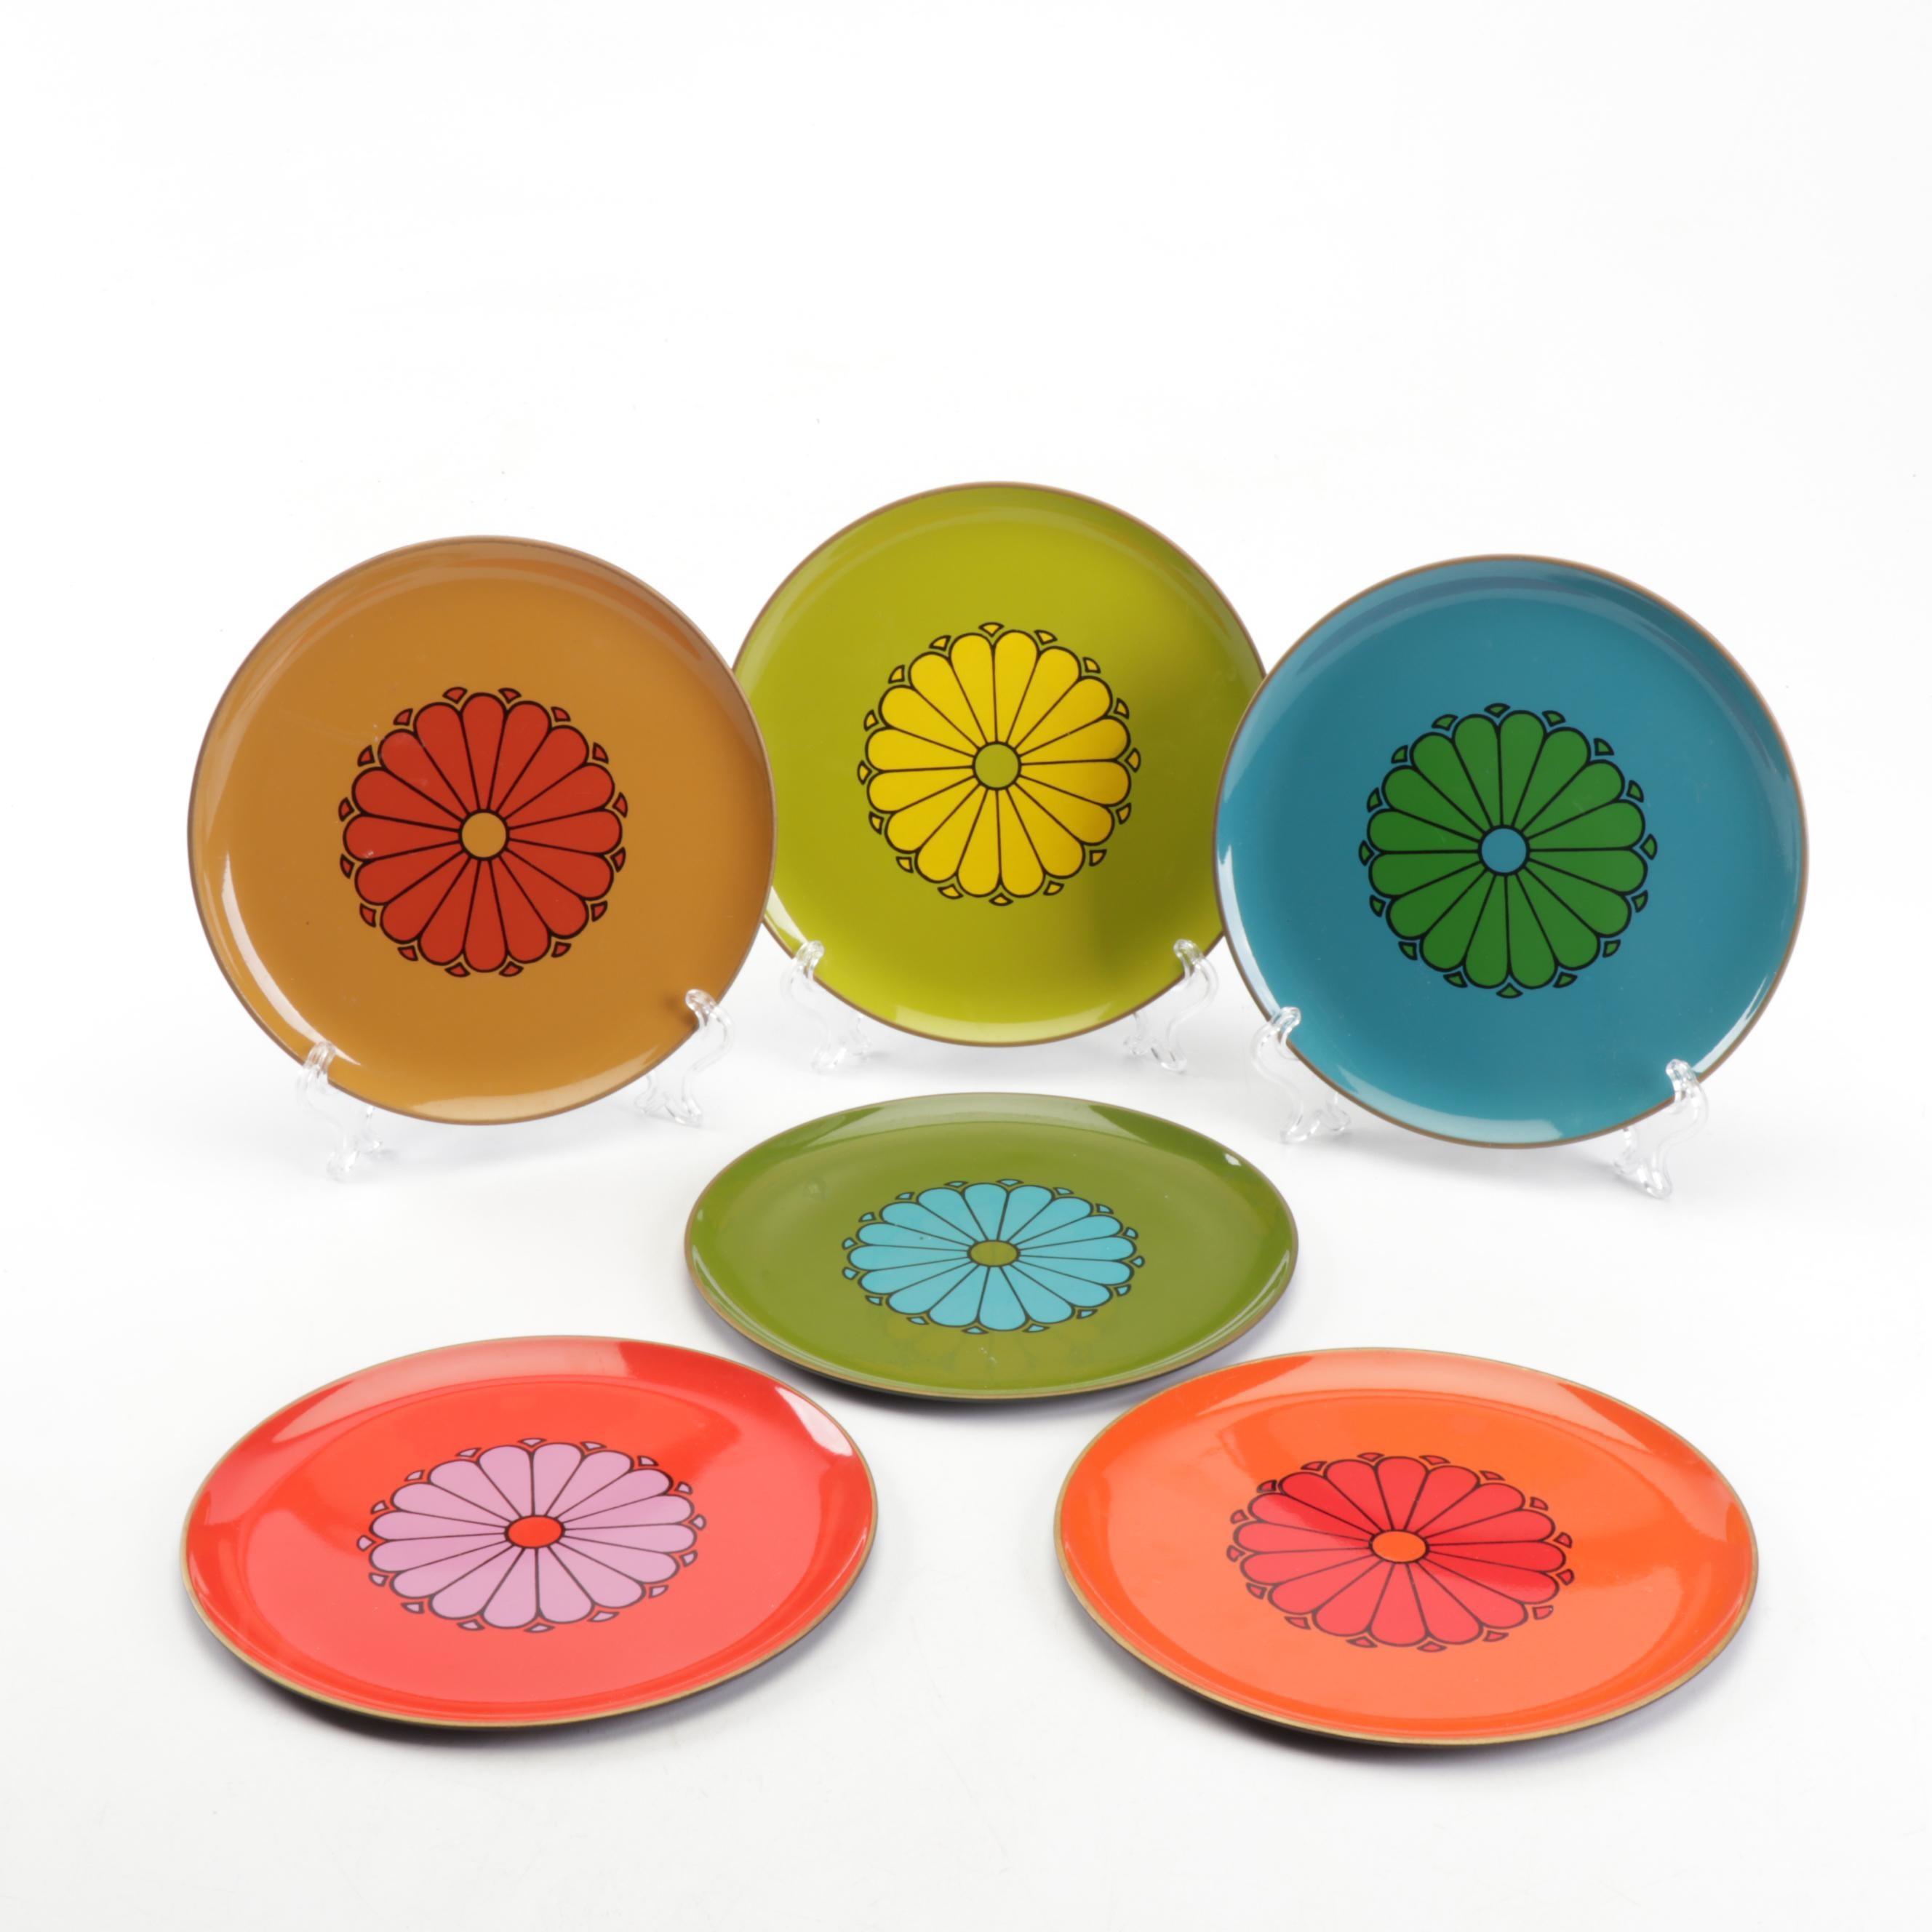 Mid Century Modern CTO Japan Melamine Plates with Flower Motif